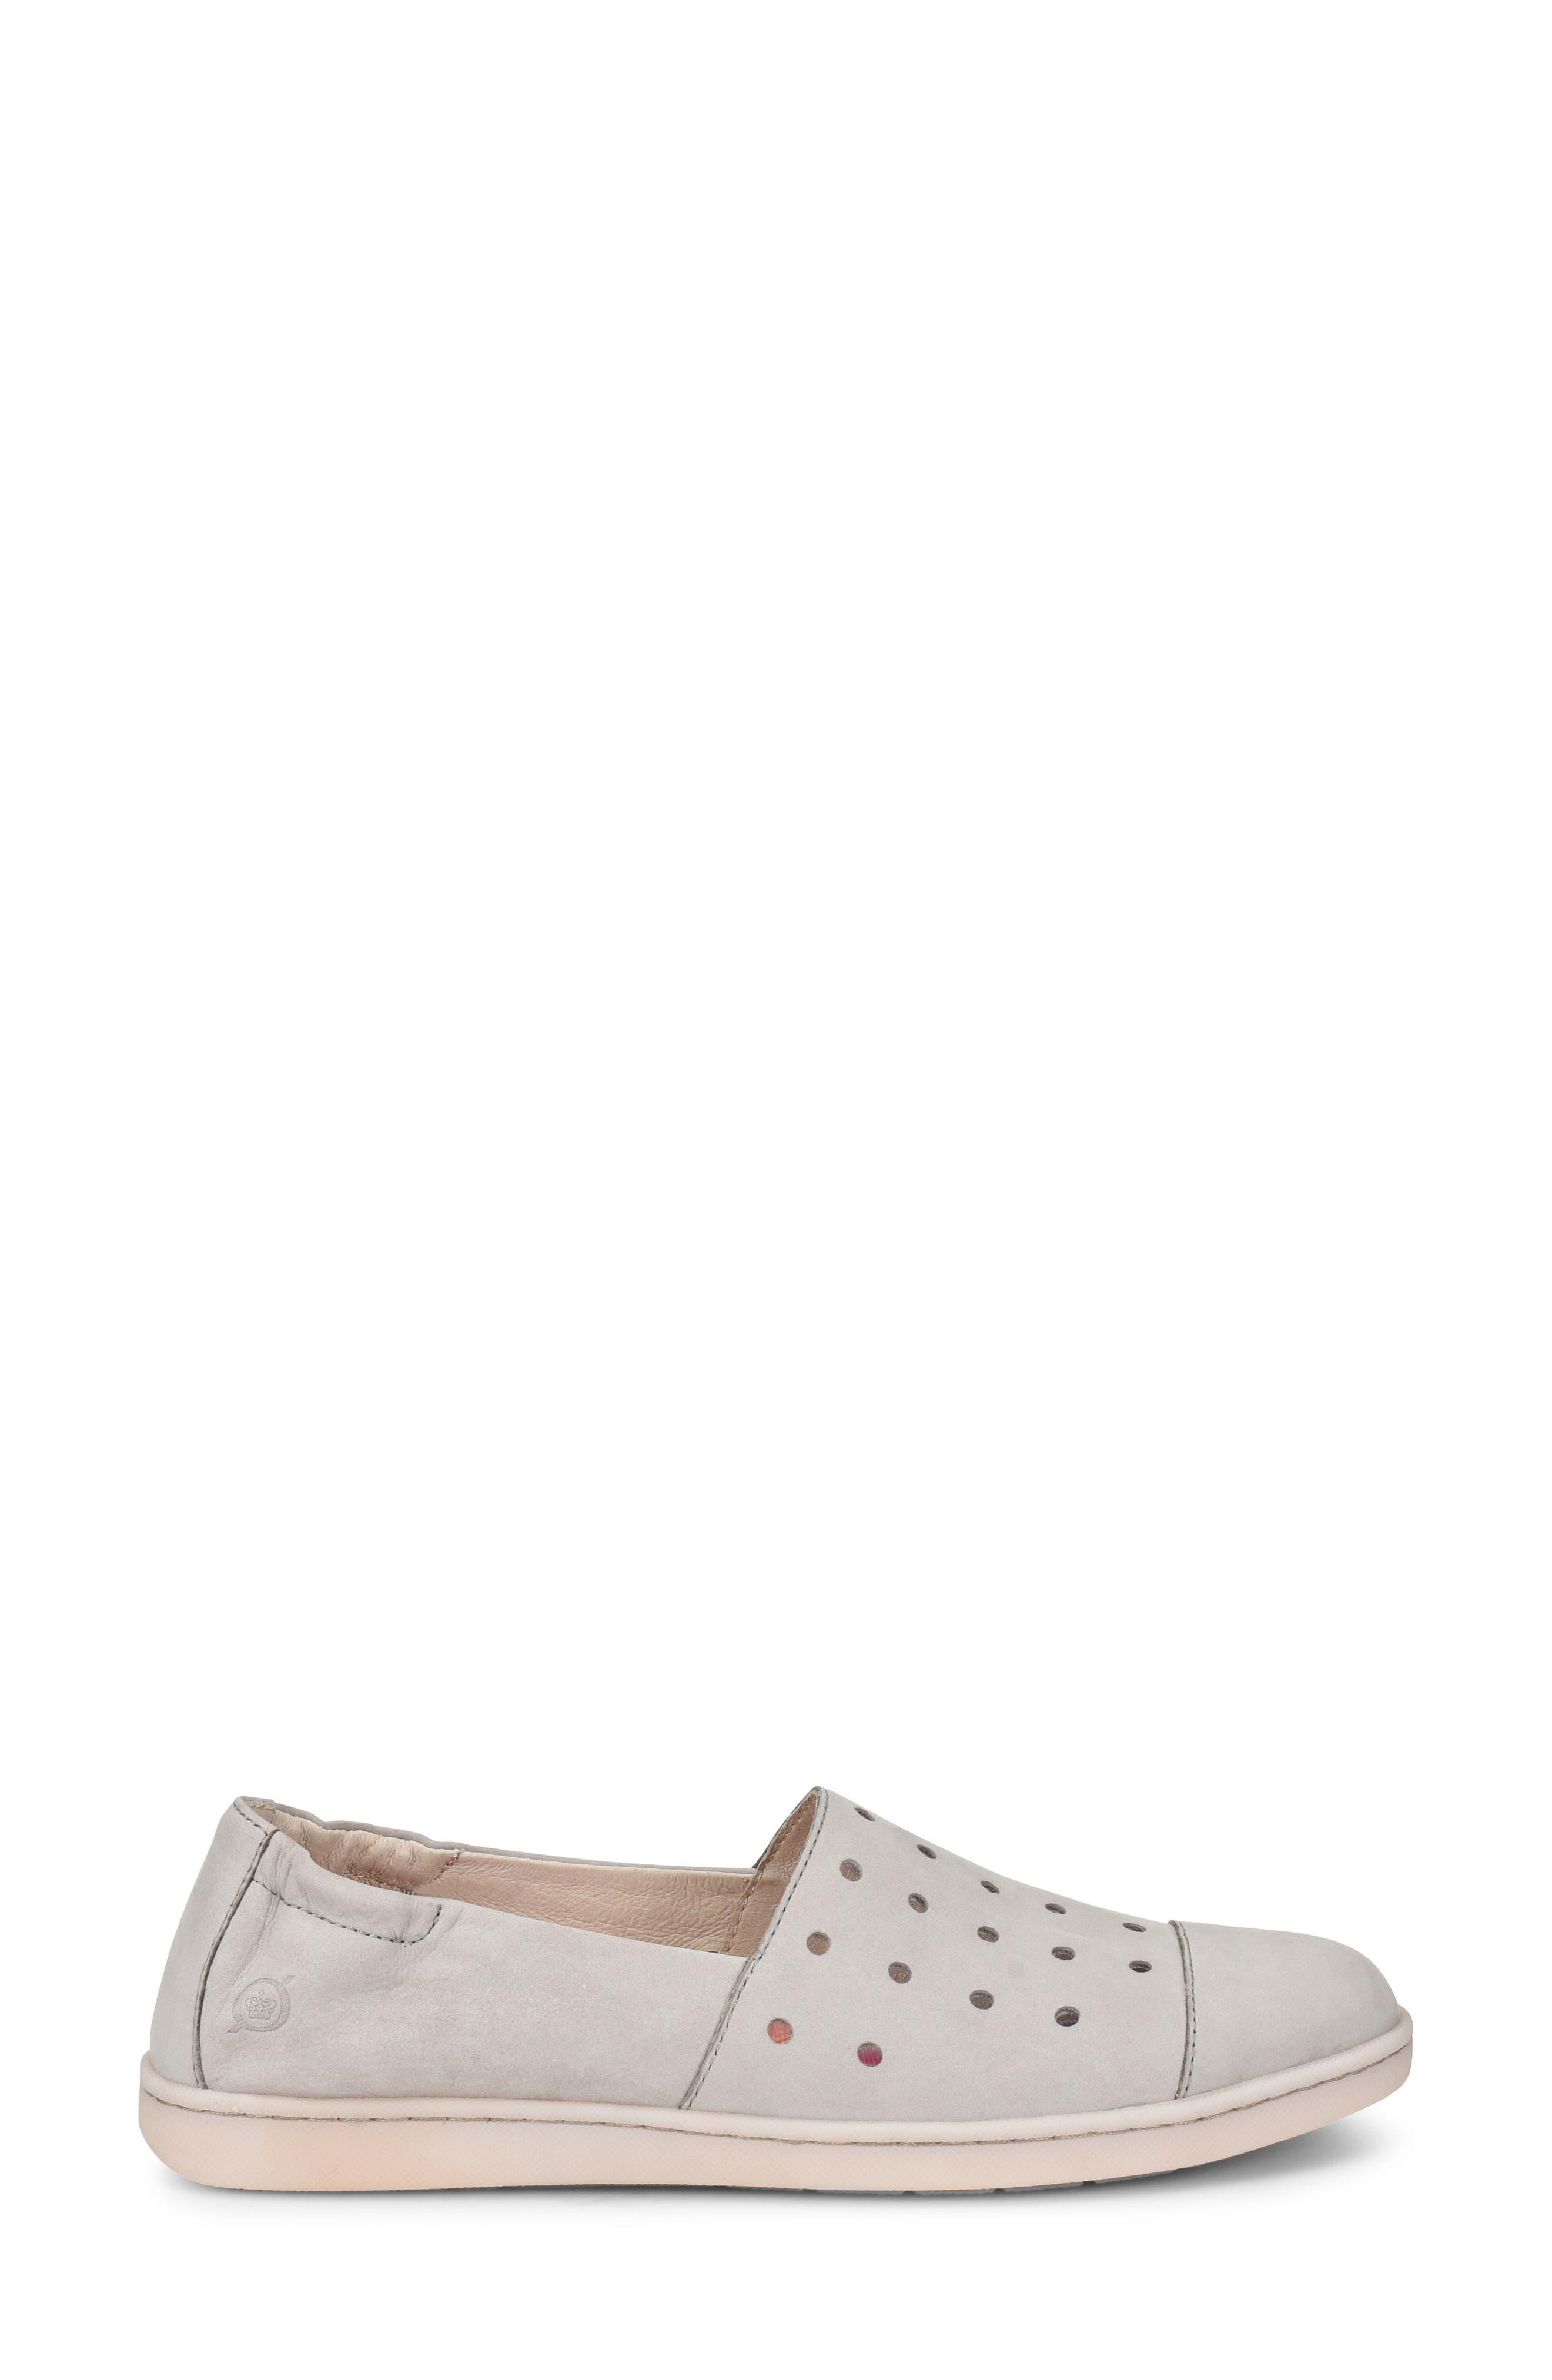 Kristin Sneaker,                             Alternate thumbnail 3, color,                             Light Grey Nubuck Leather